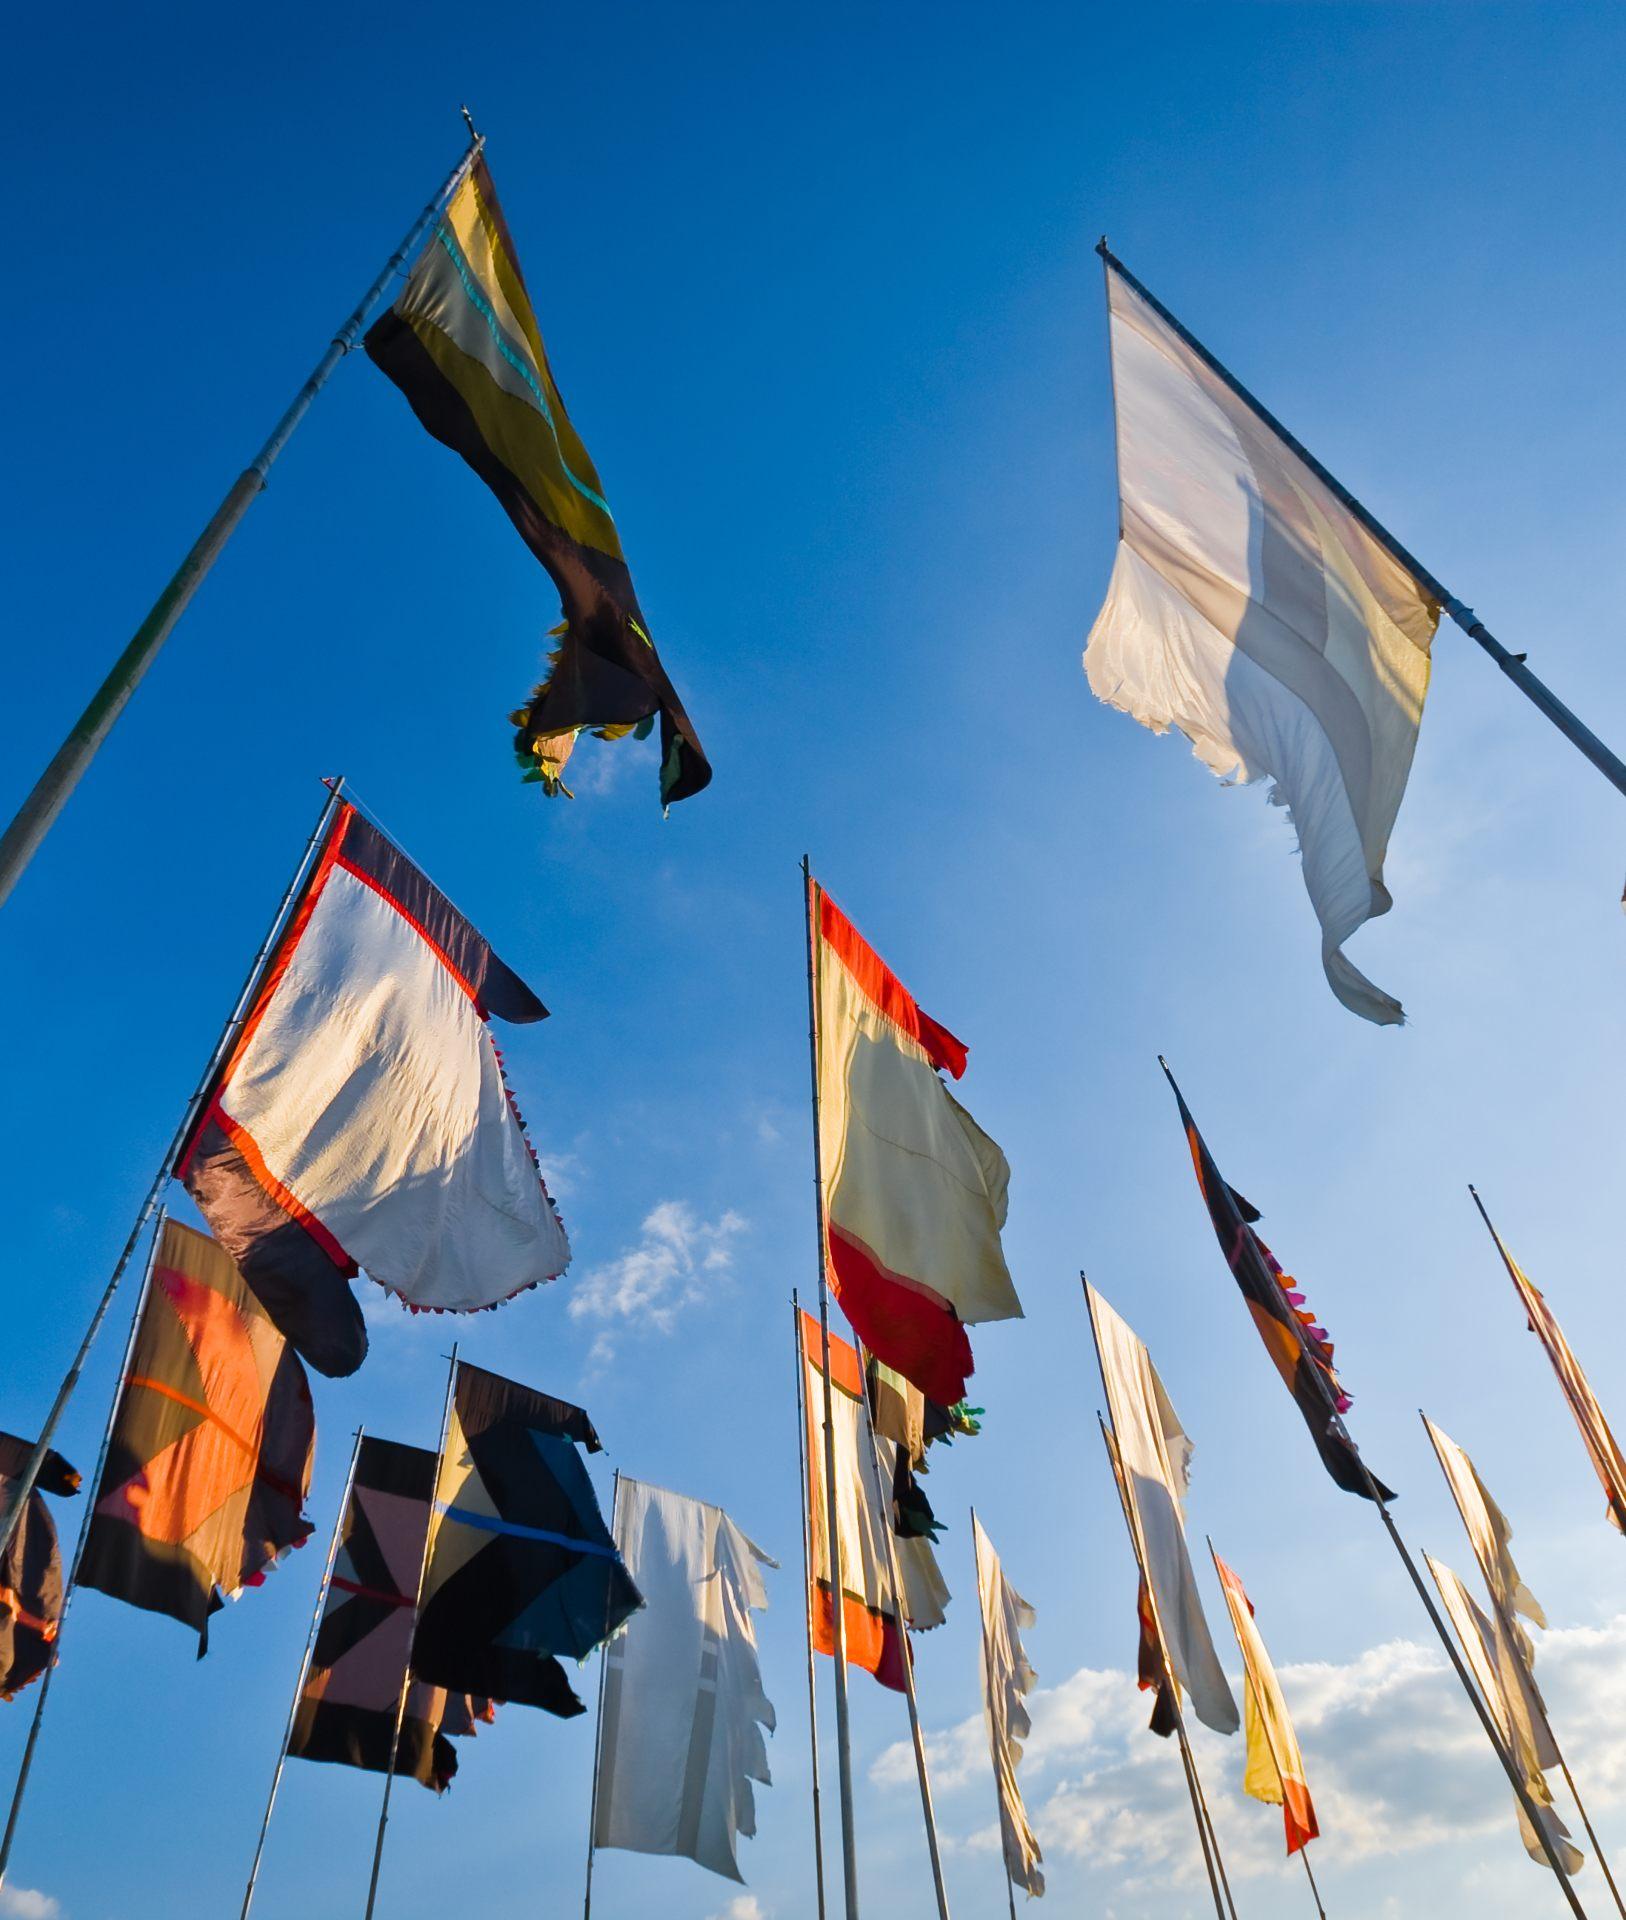 festival flags